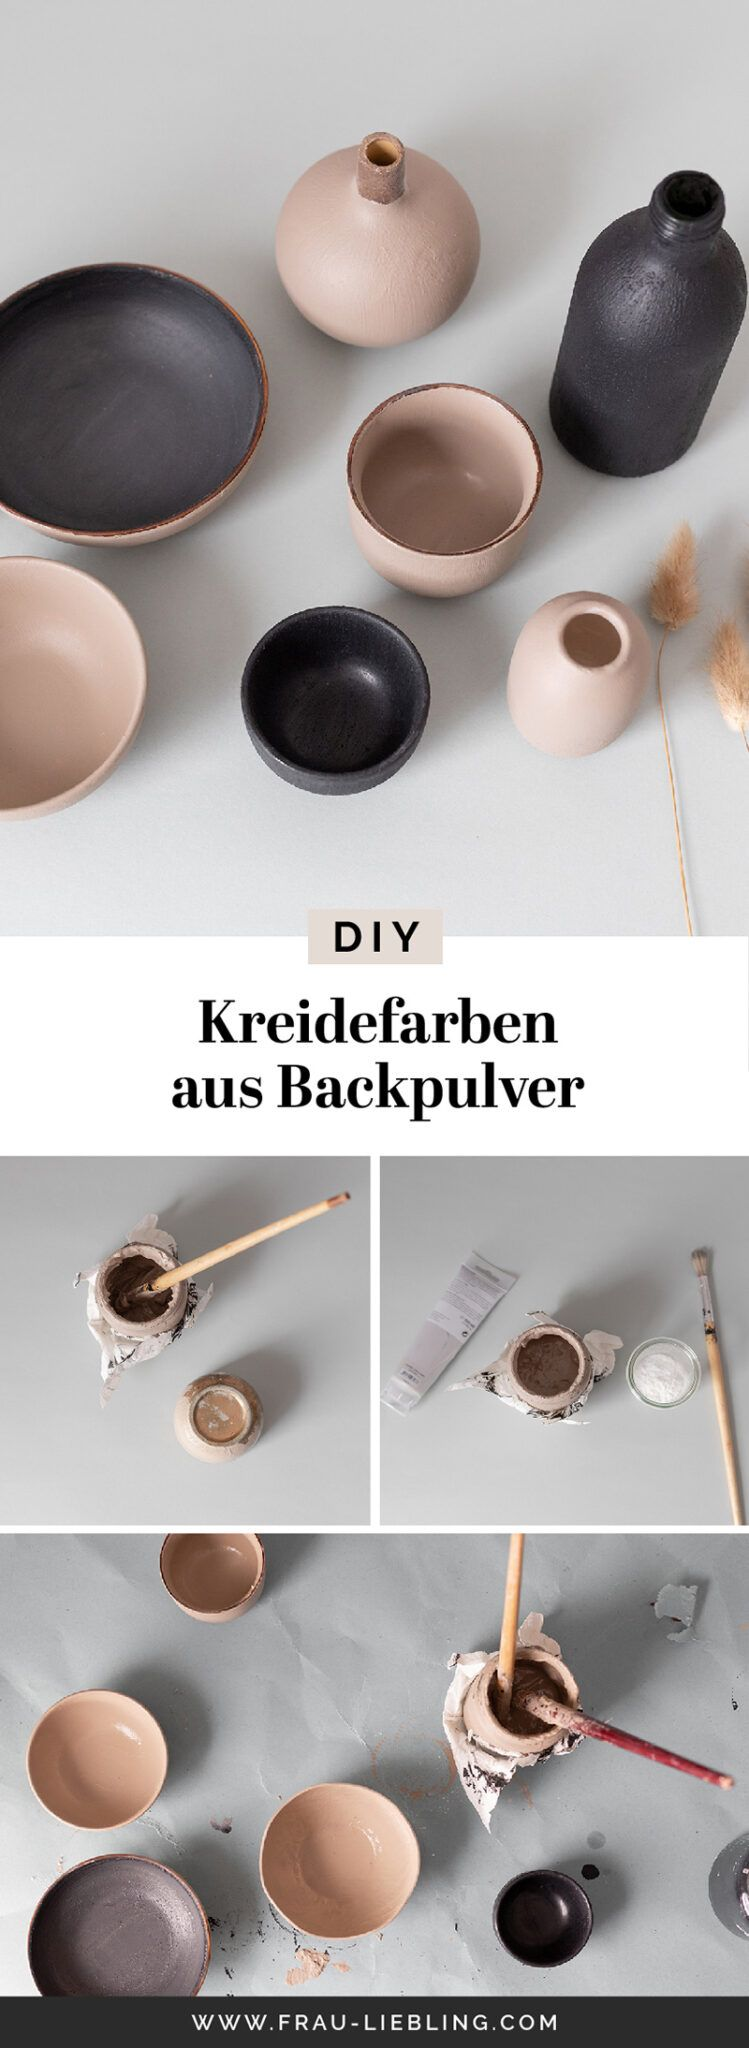 DIY Kreidefarbe aus Backpulver - Deko neu bemalen